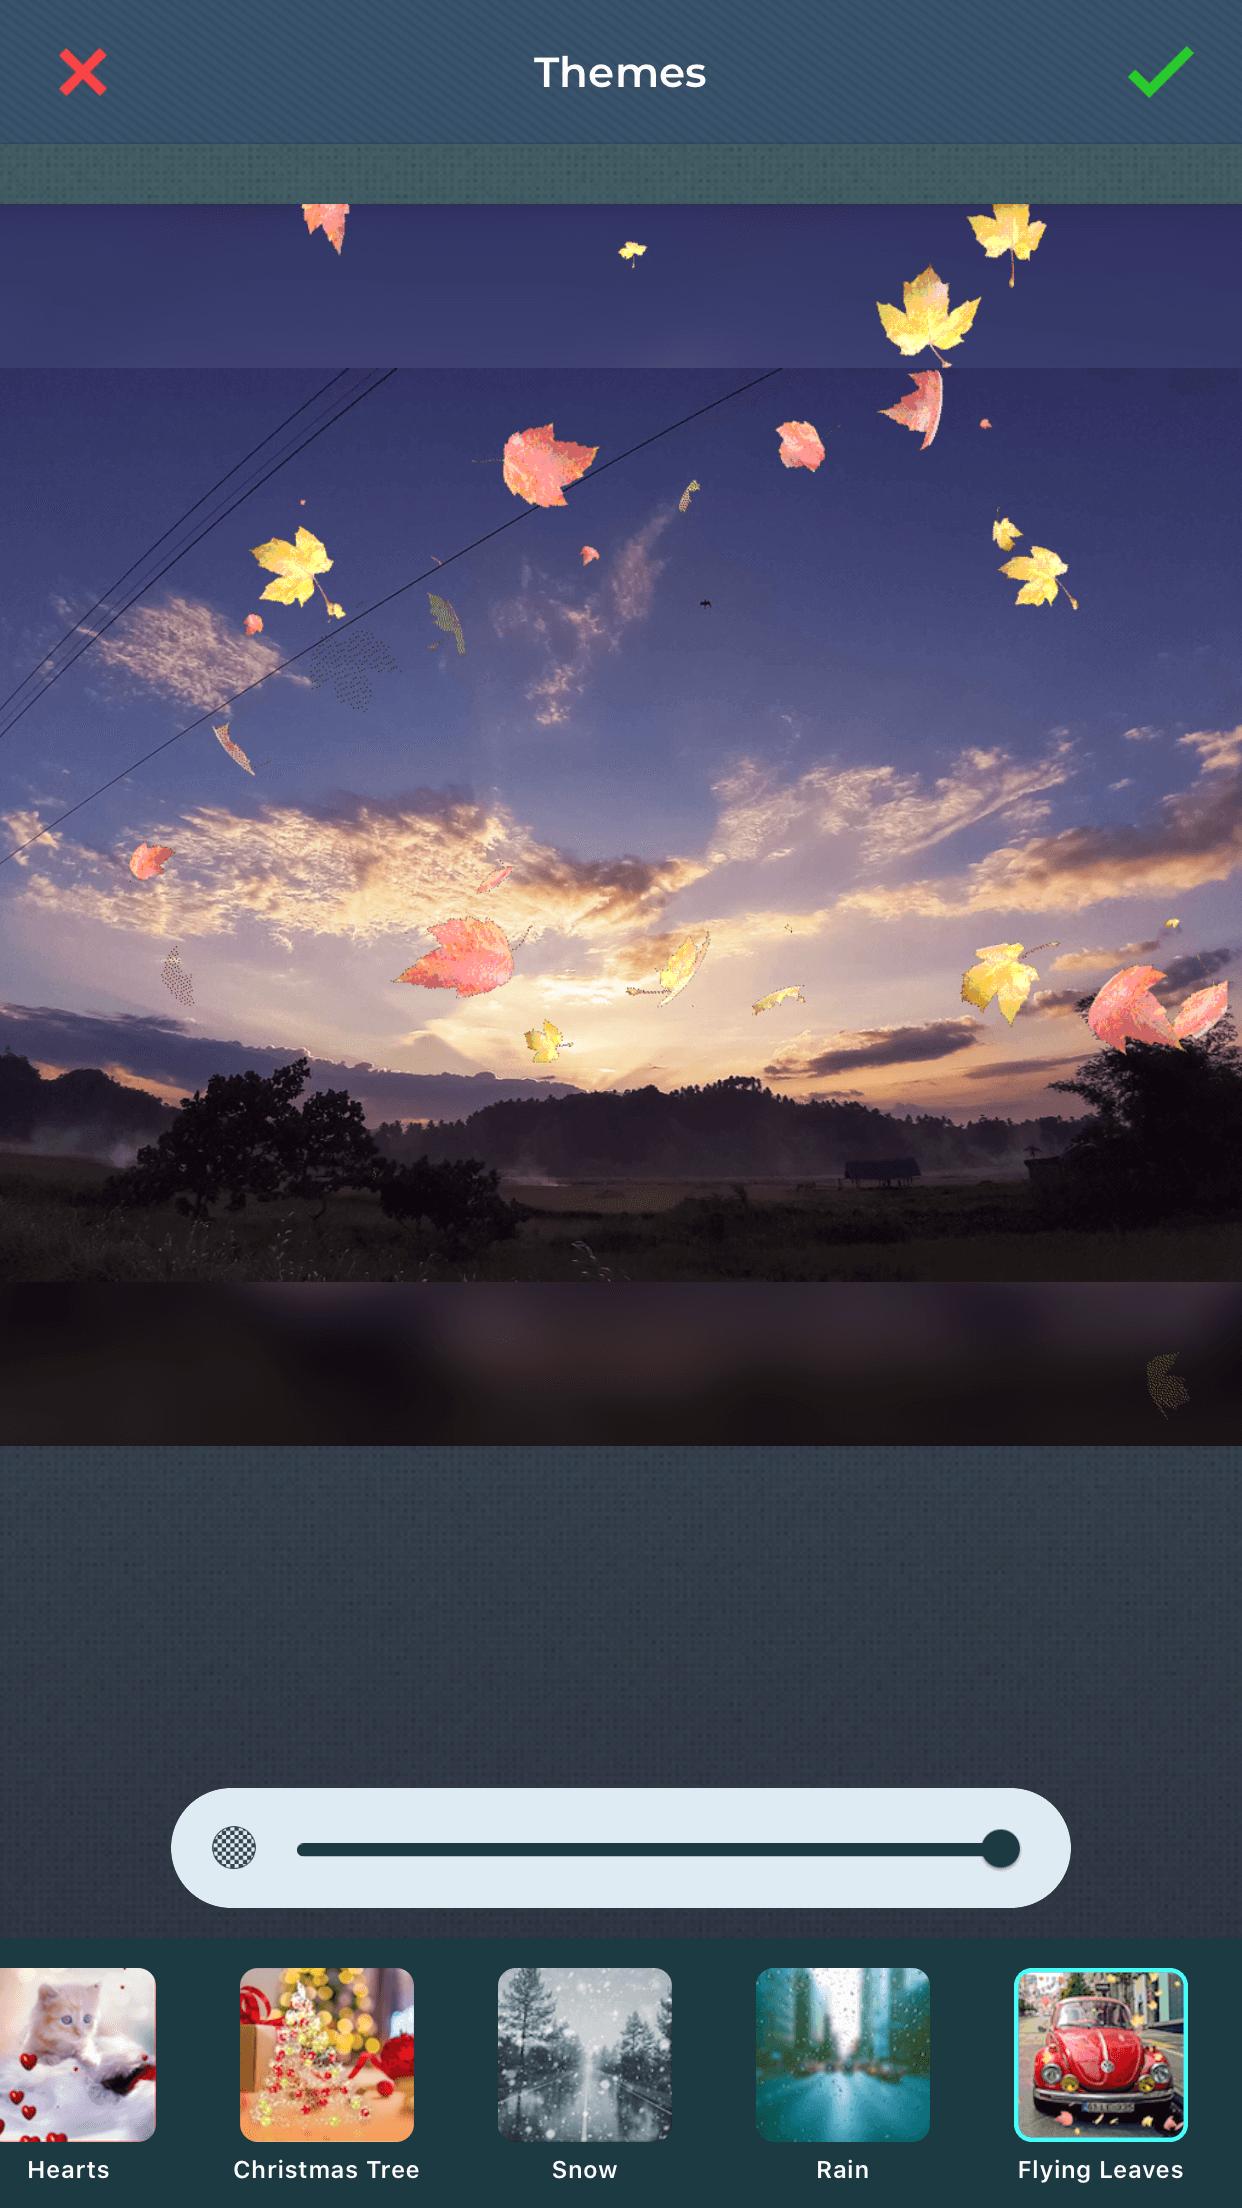 Apply beautiful themes to slideshow using slideshow maker app.